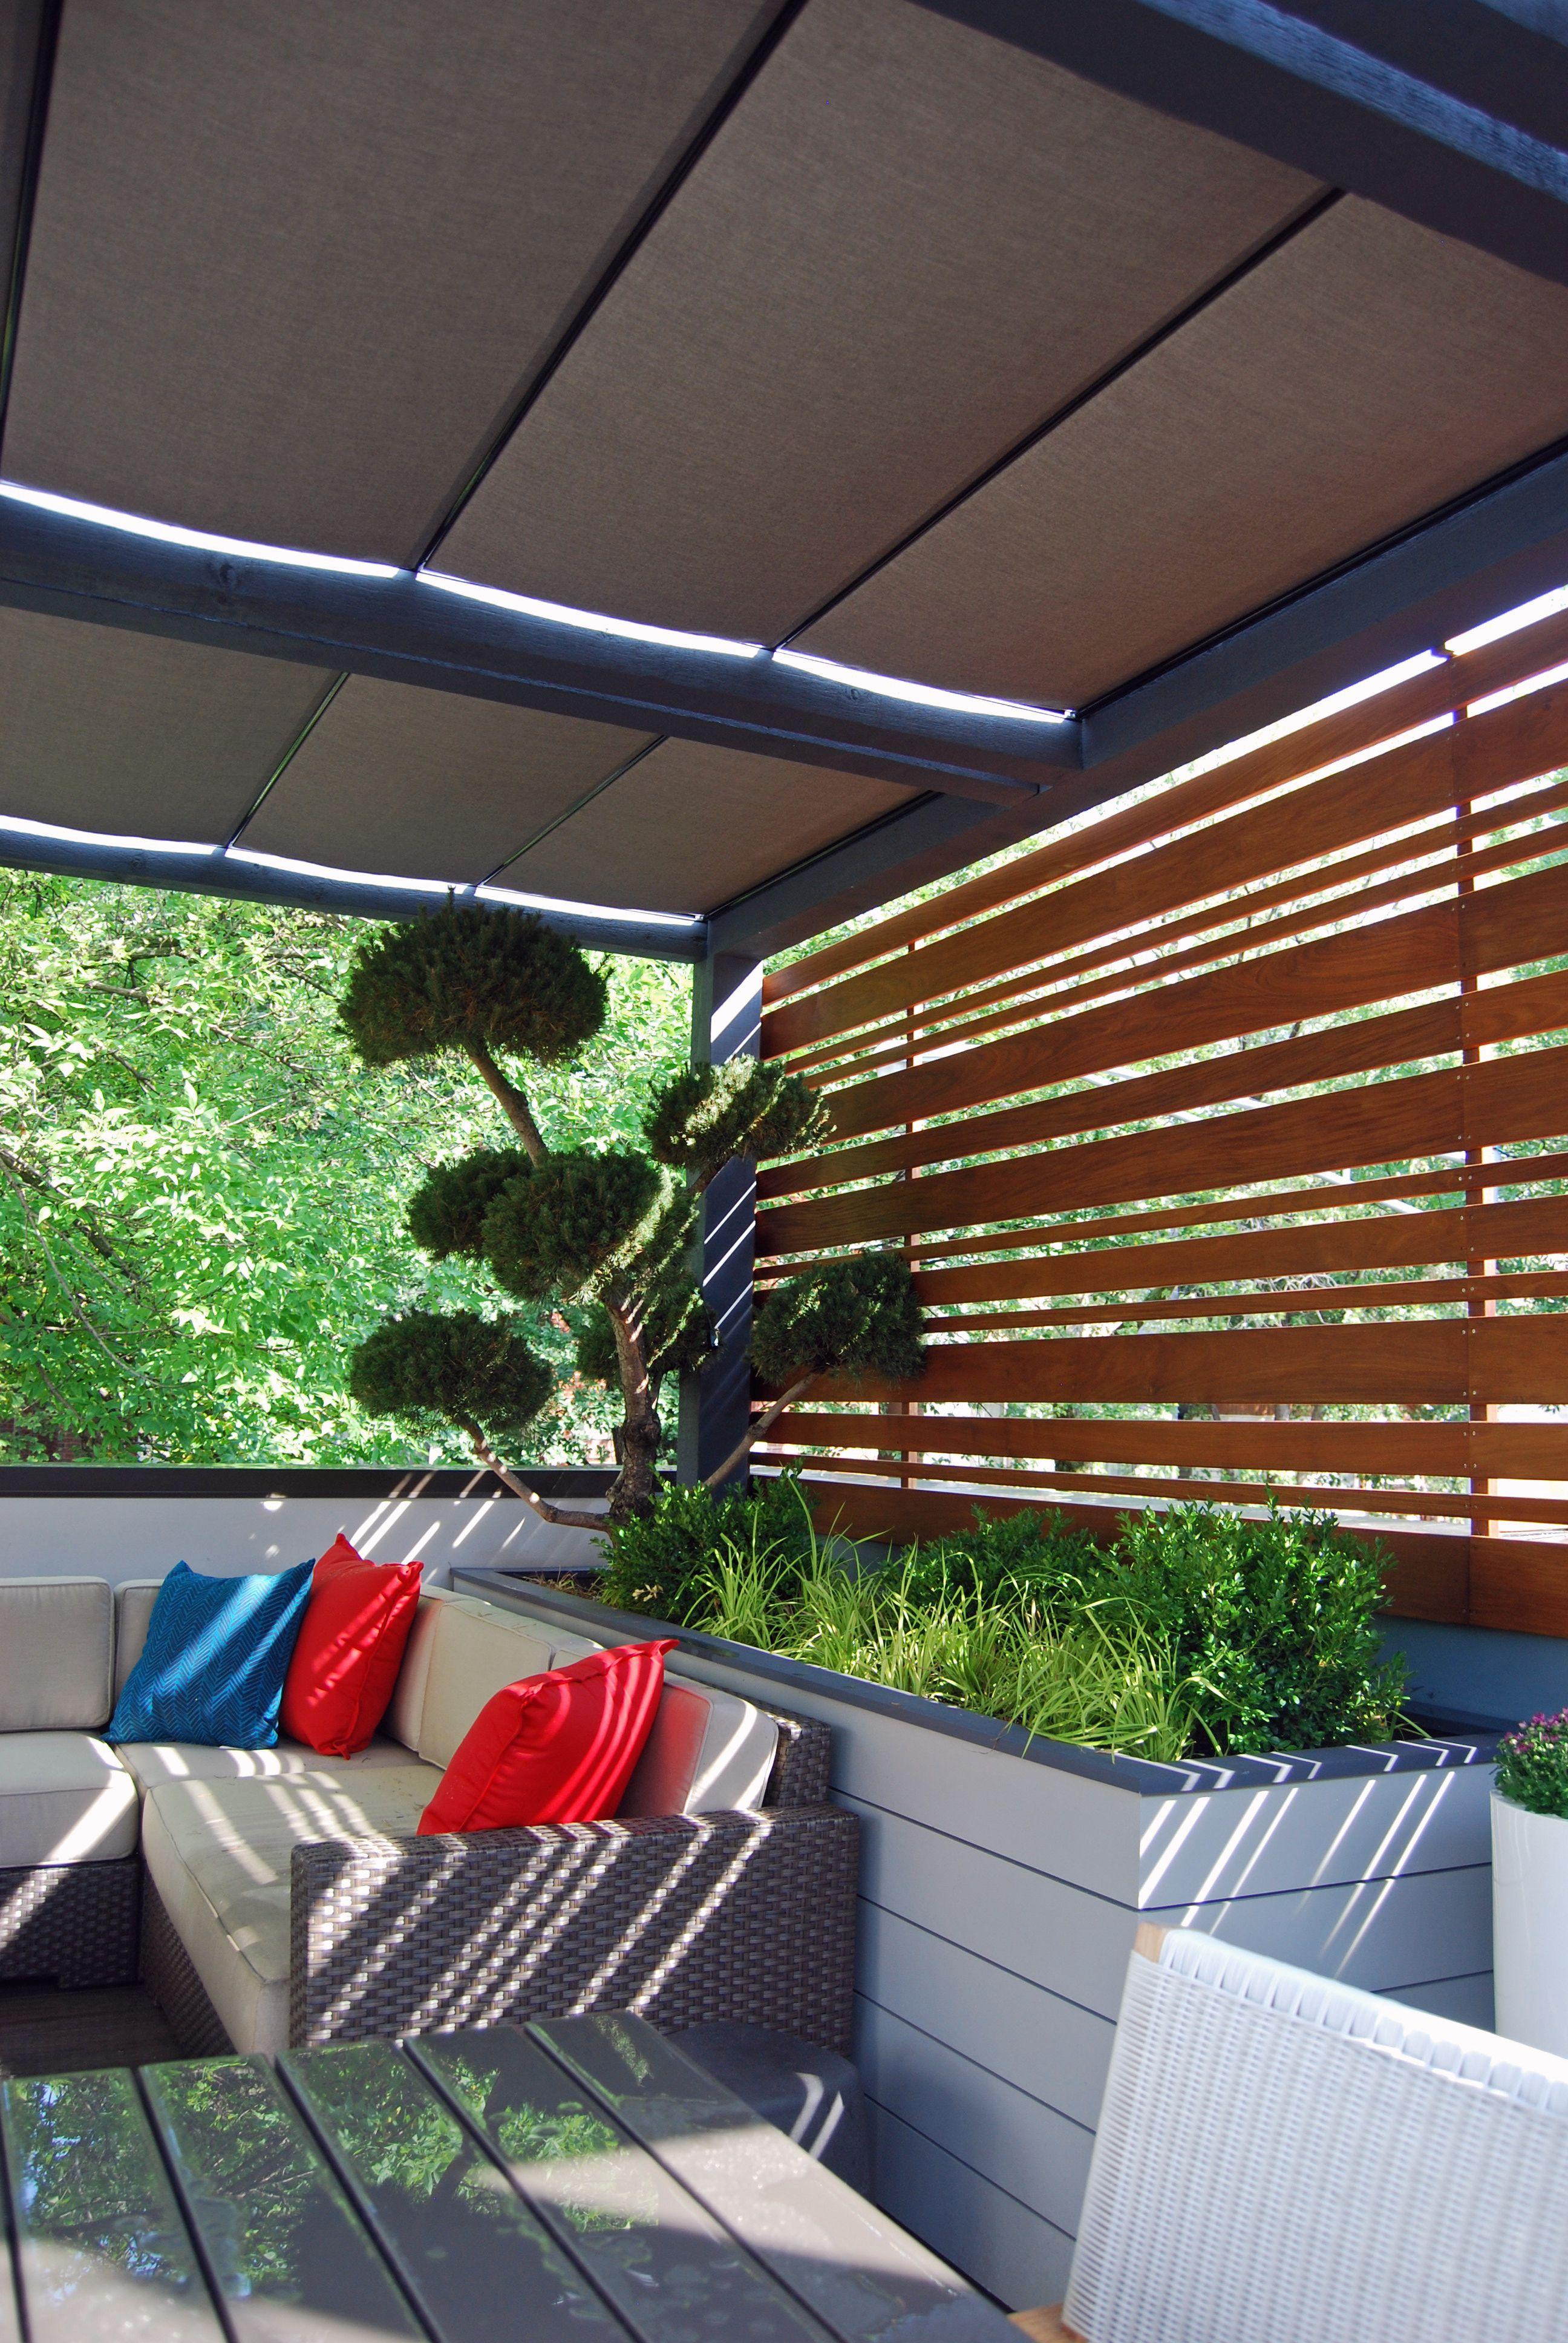 Roof Deck Pergola Retractable Shade Urban Landscape Garden Design